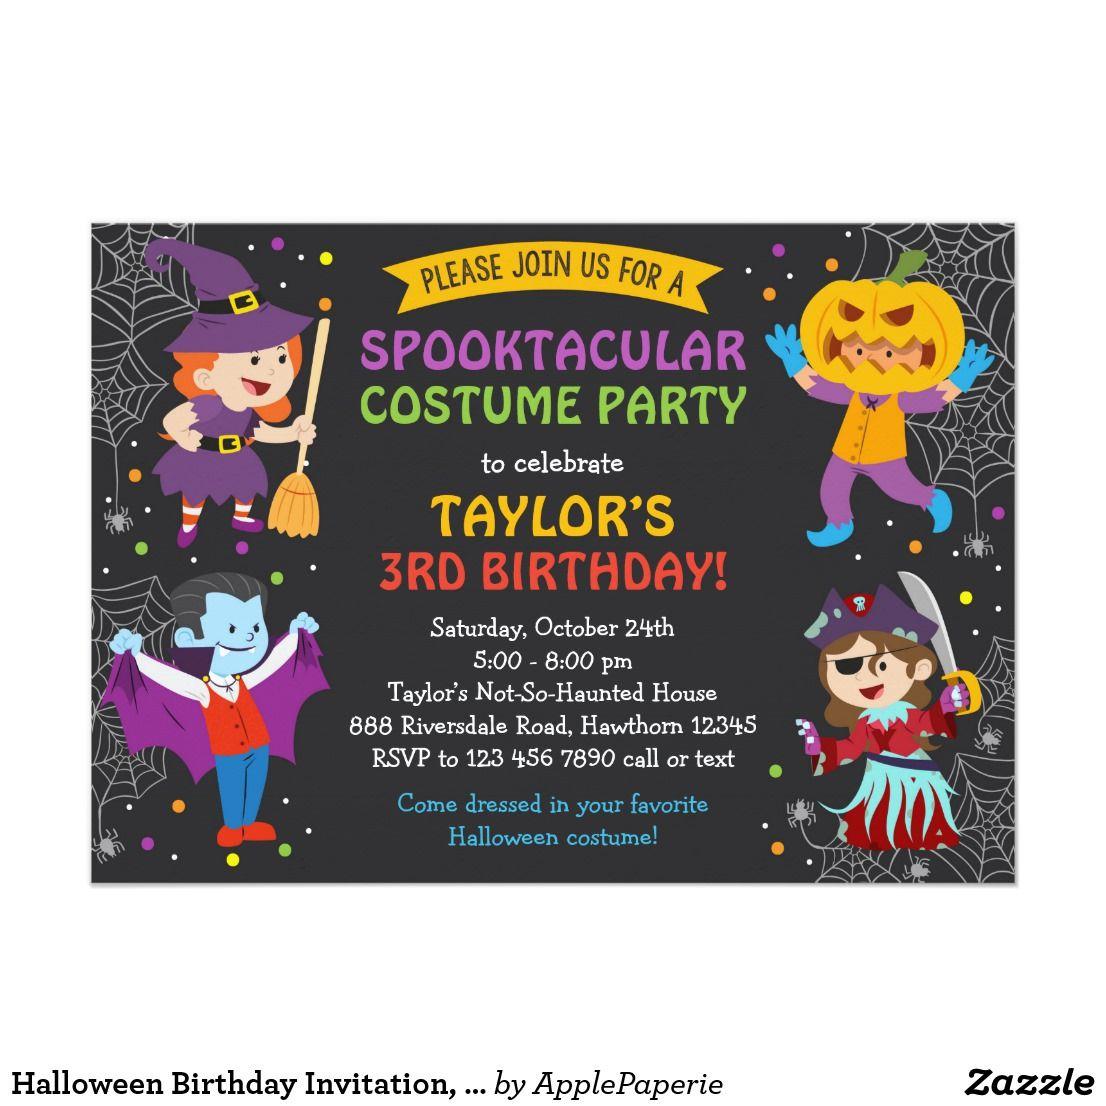 Halloween Birthday Invitation, costume party, kids Invitation ...